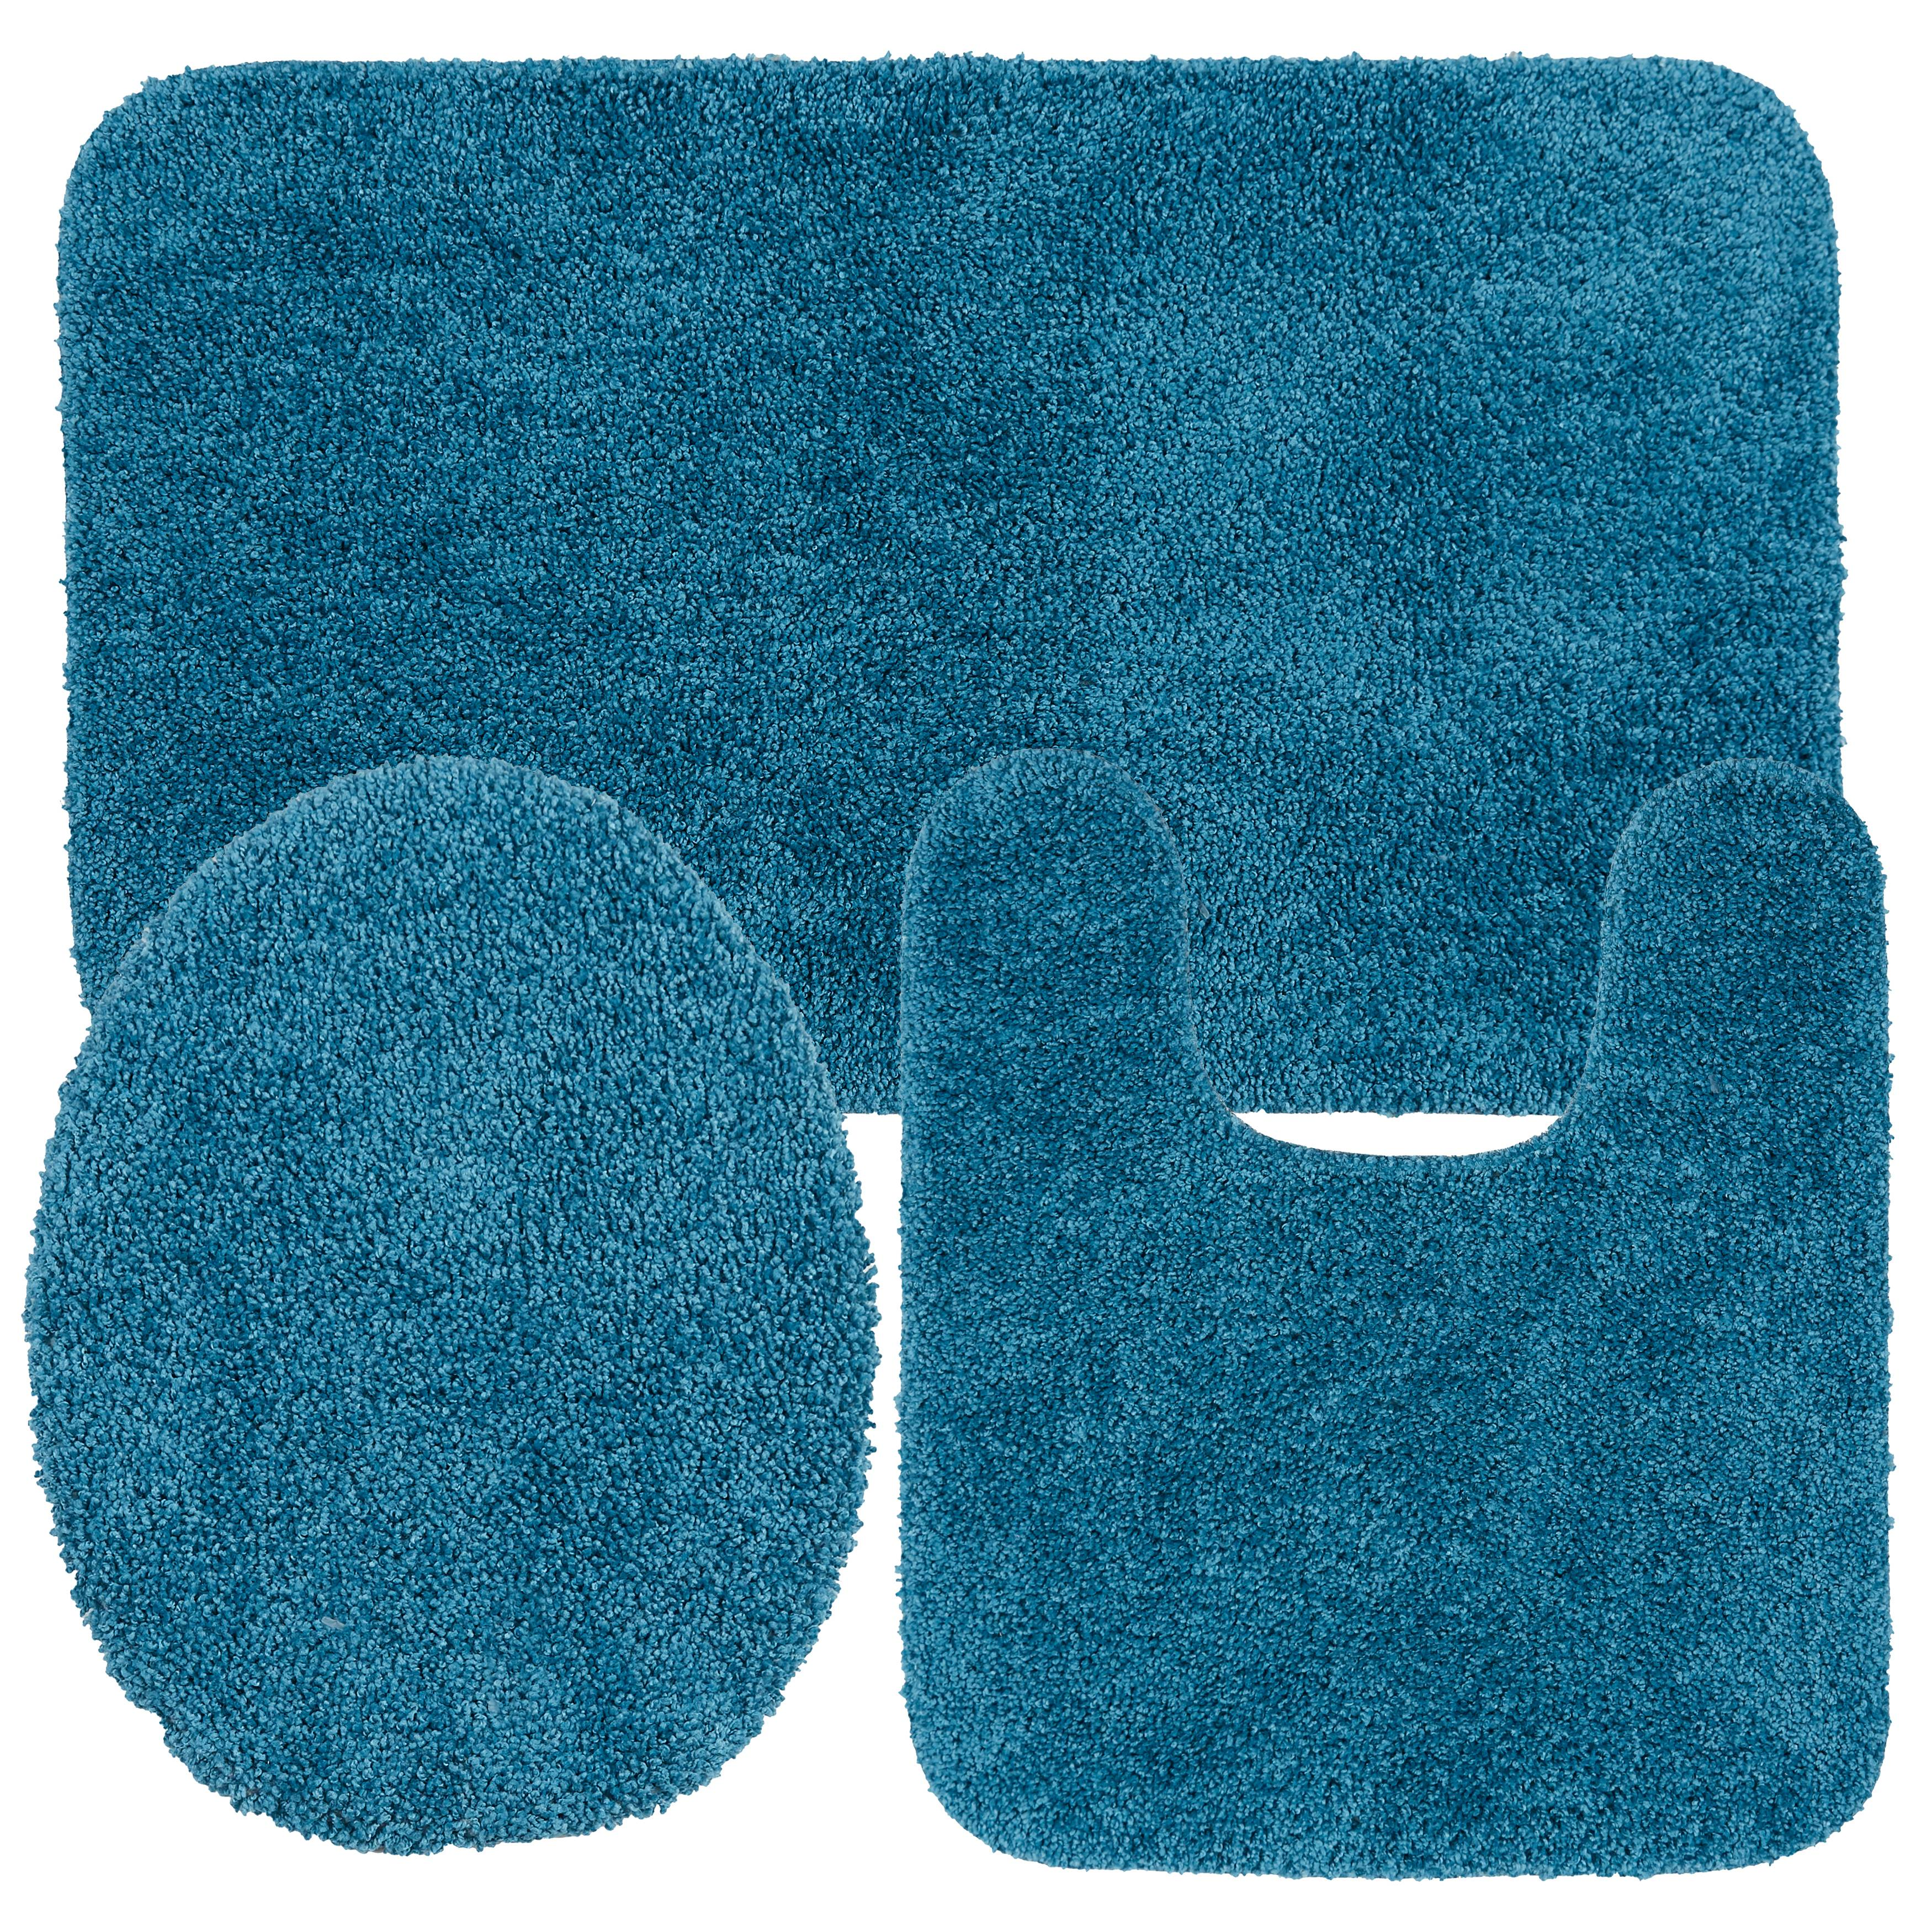 Cute Sky Blue Light Teal Gray Moroccan Ogee Art Absorbent Memory Foam Soft Shower Bath Rugs Contour Mat And Lid Cover,Non Slip Velvet Bathrug,Shower Toilet Bathmats Carpet Yilooom 3 Pack Bath Mat Set